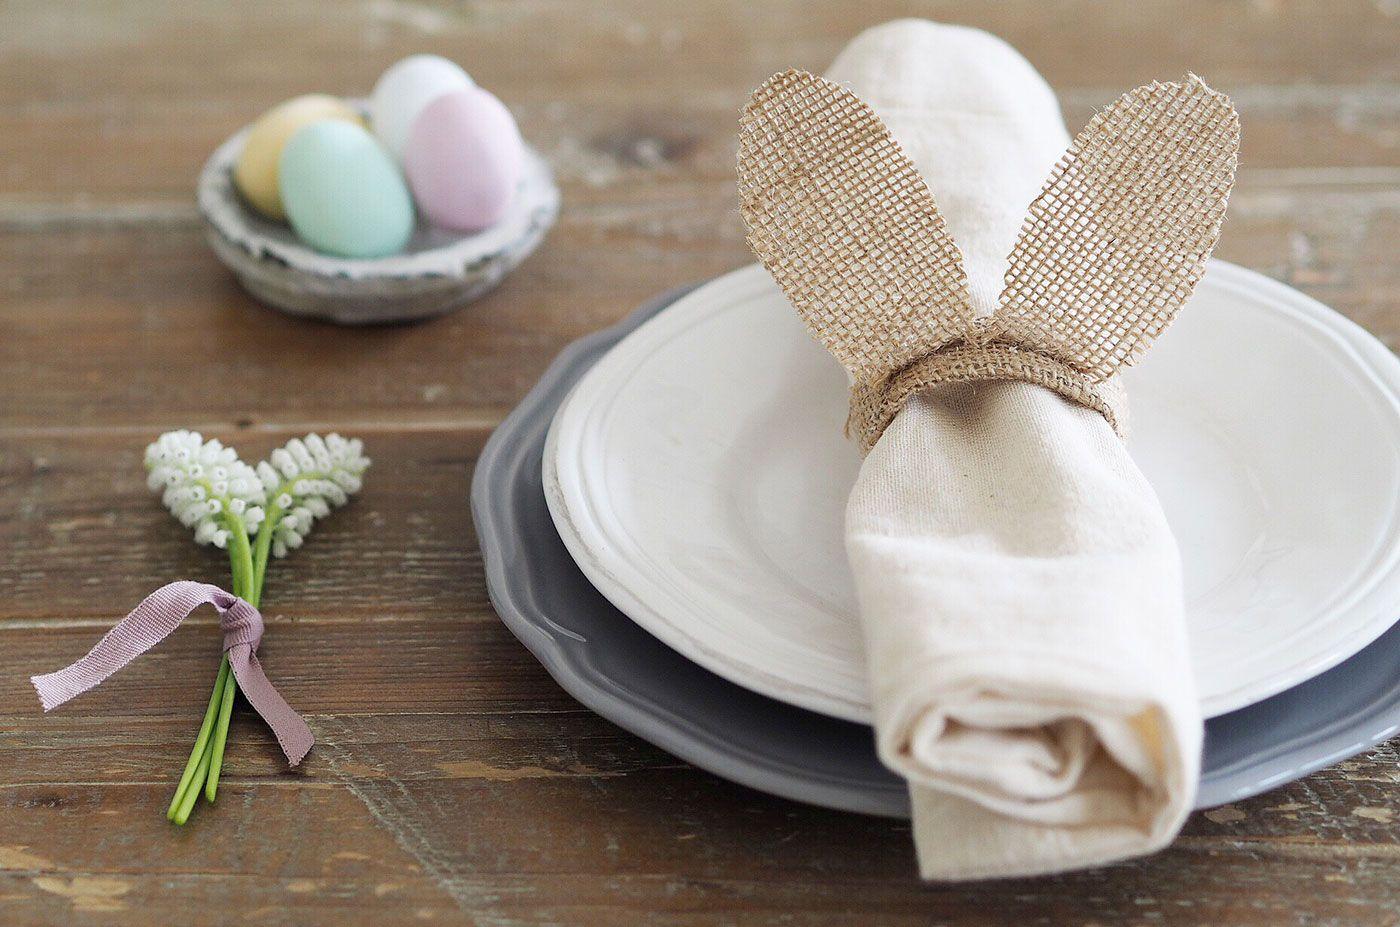 Bunny Napkin Holder Easter decorations diy easy, Bunny